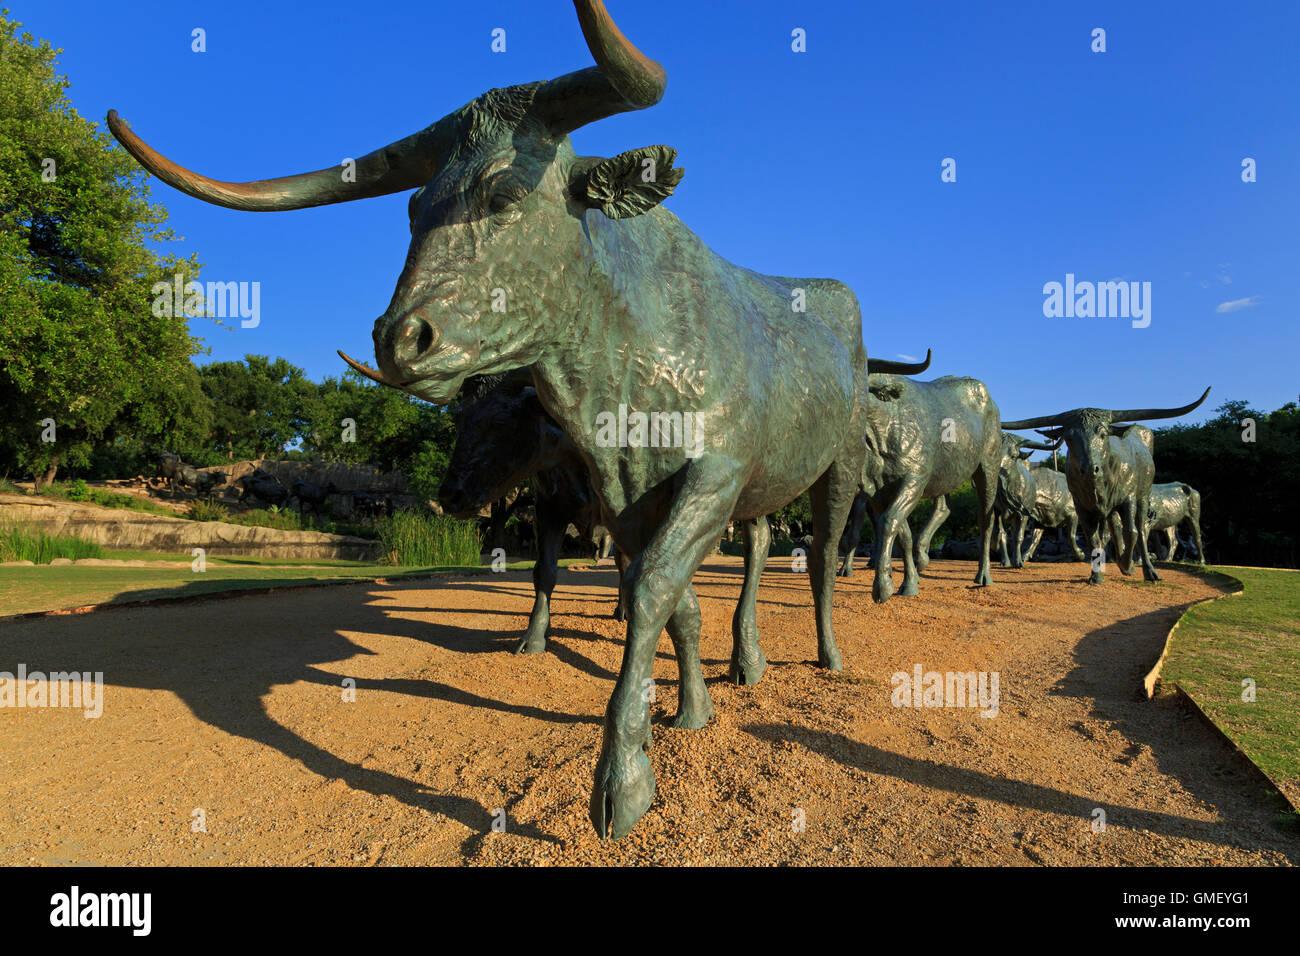 Pioneer Plaza, Dallas, Texas, USA - Stock Image